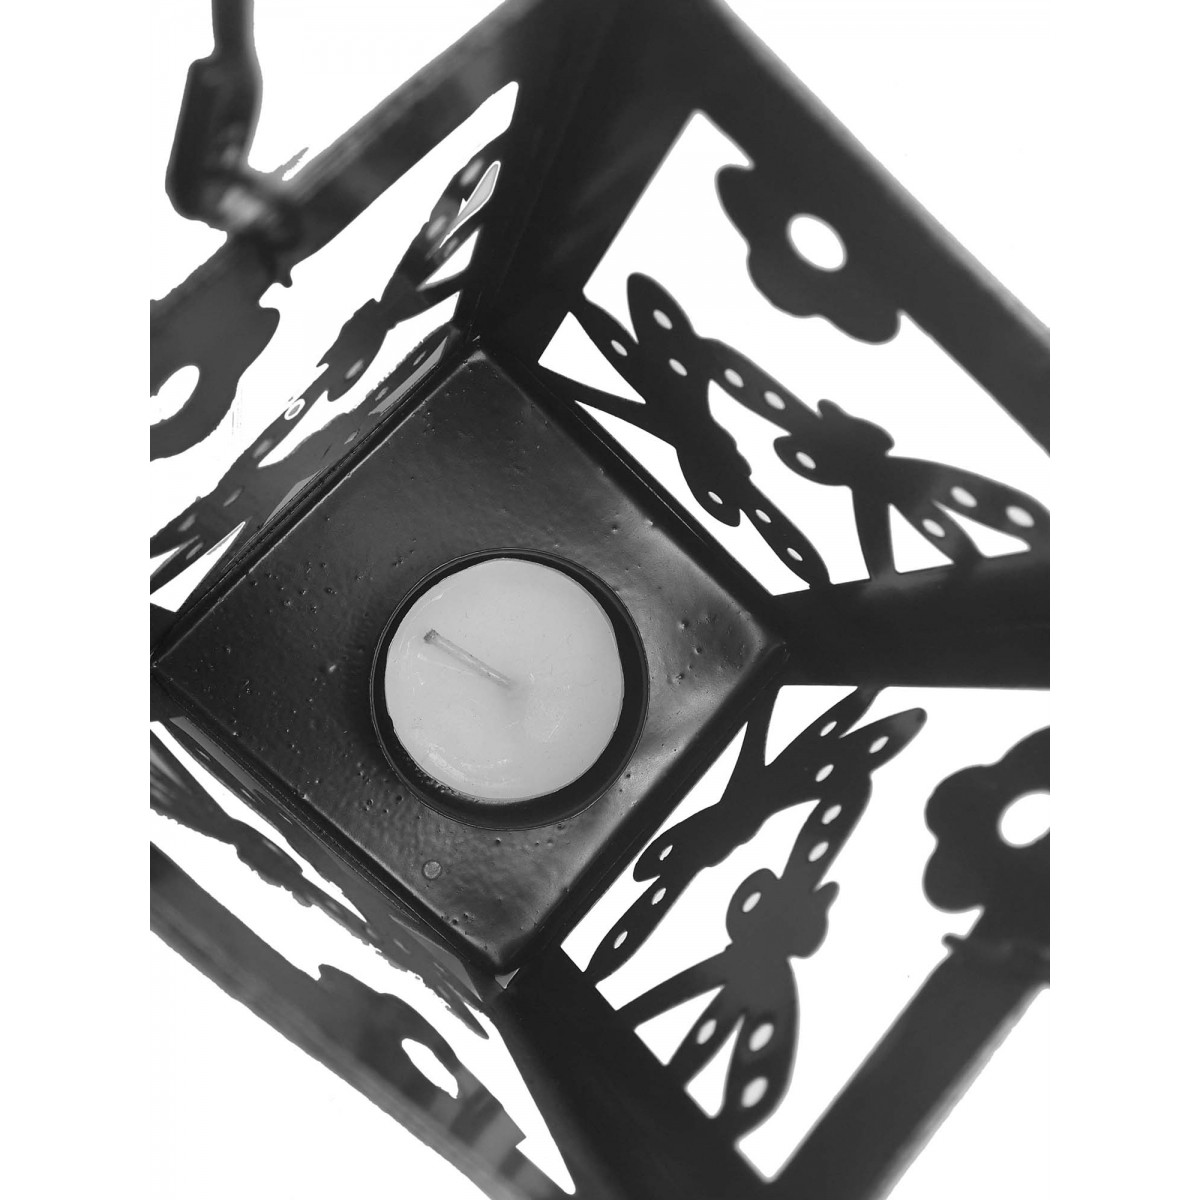 Lanterna Decorativa Porta Vela Enfeite Jardim Metal Lampiao Amarela 2 Unid (jard-75)